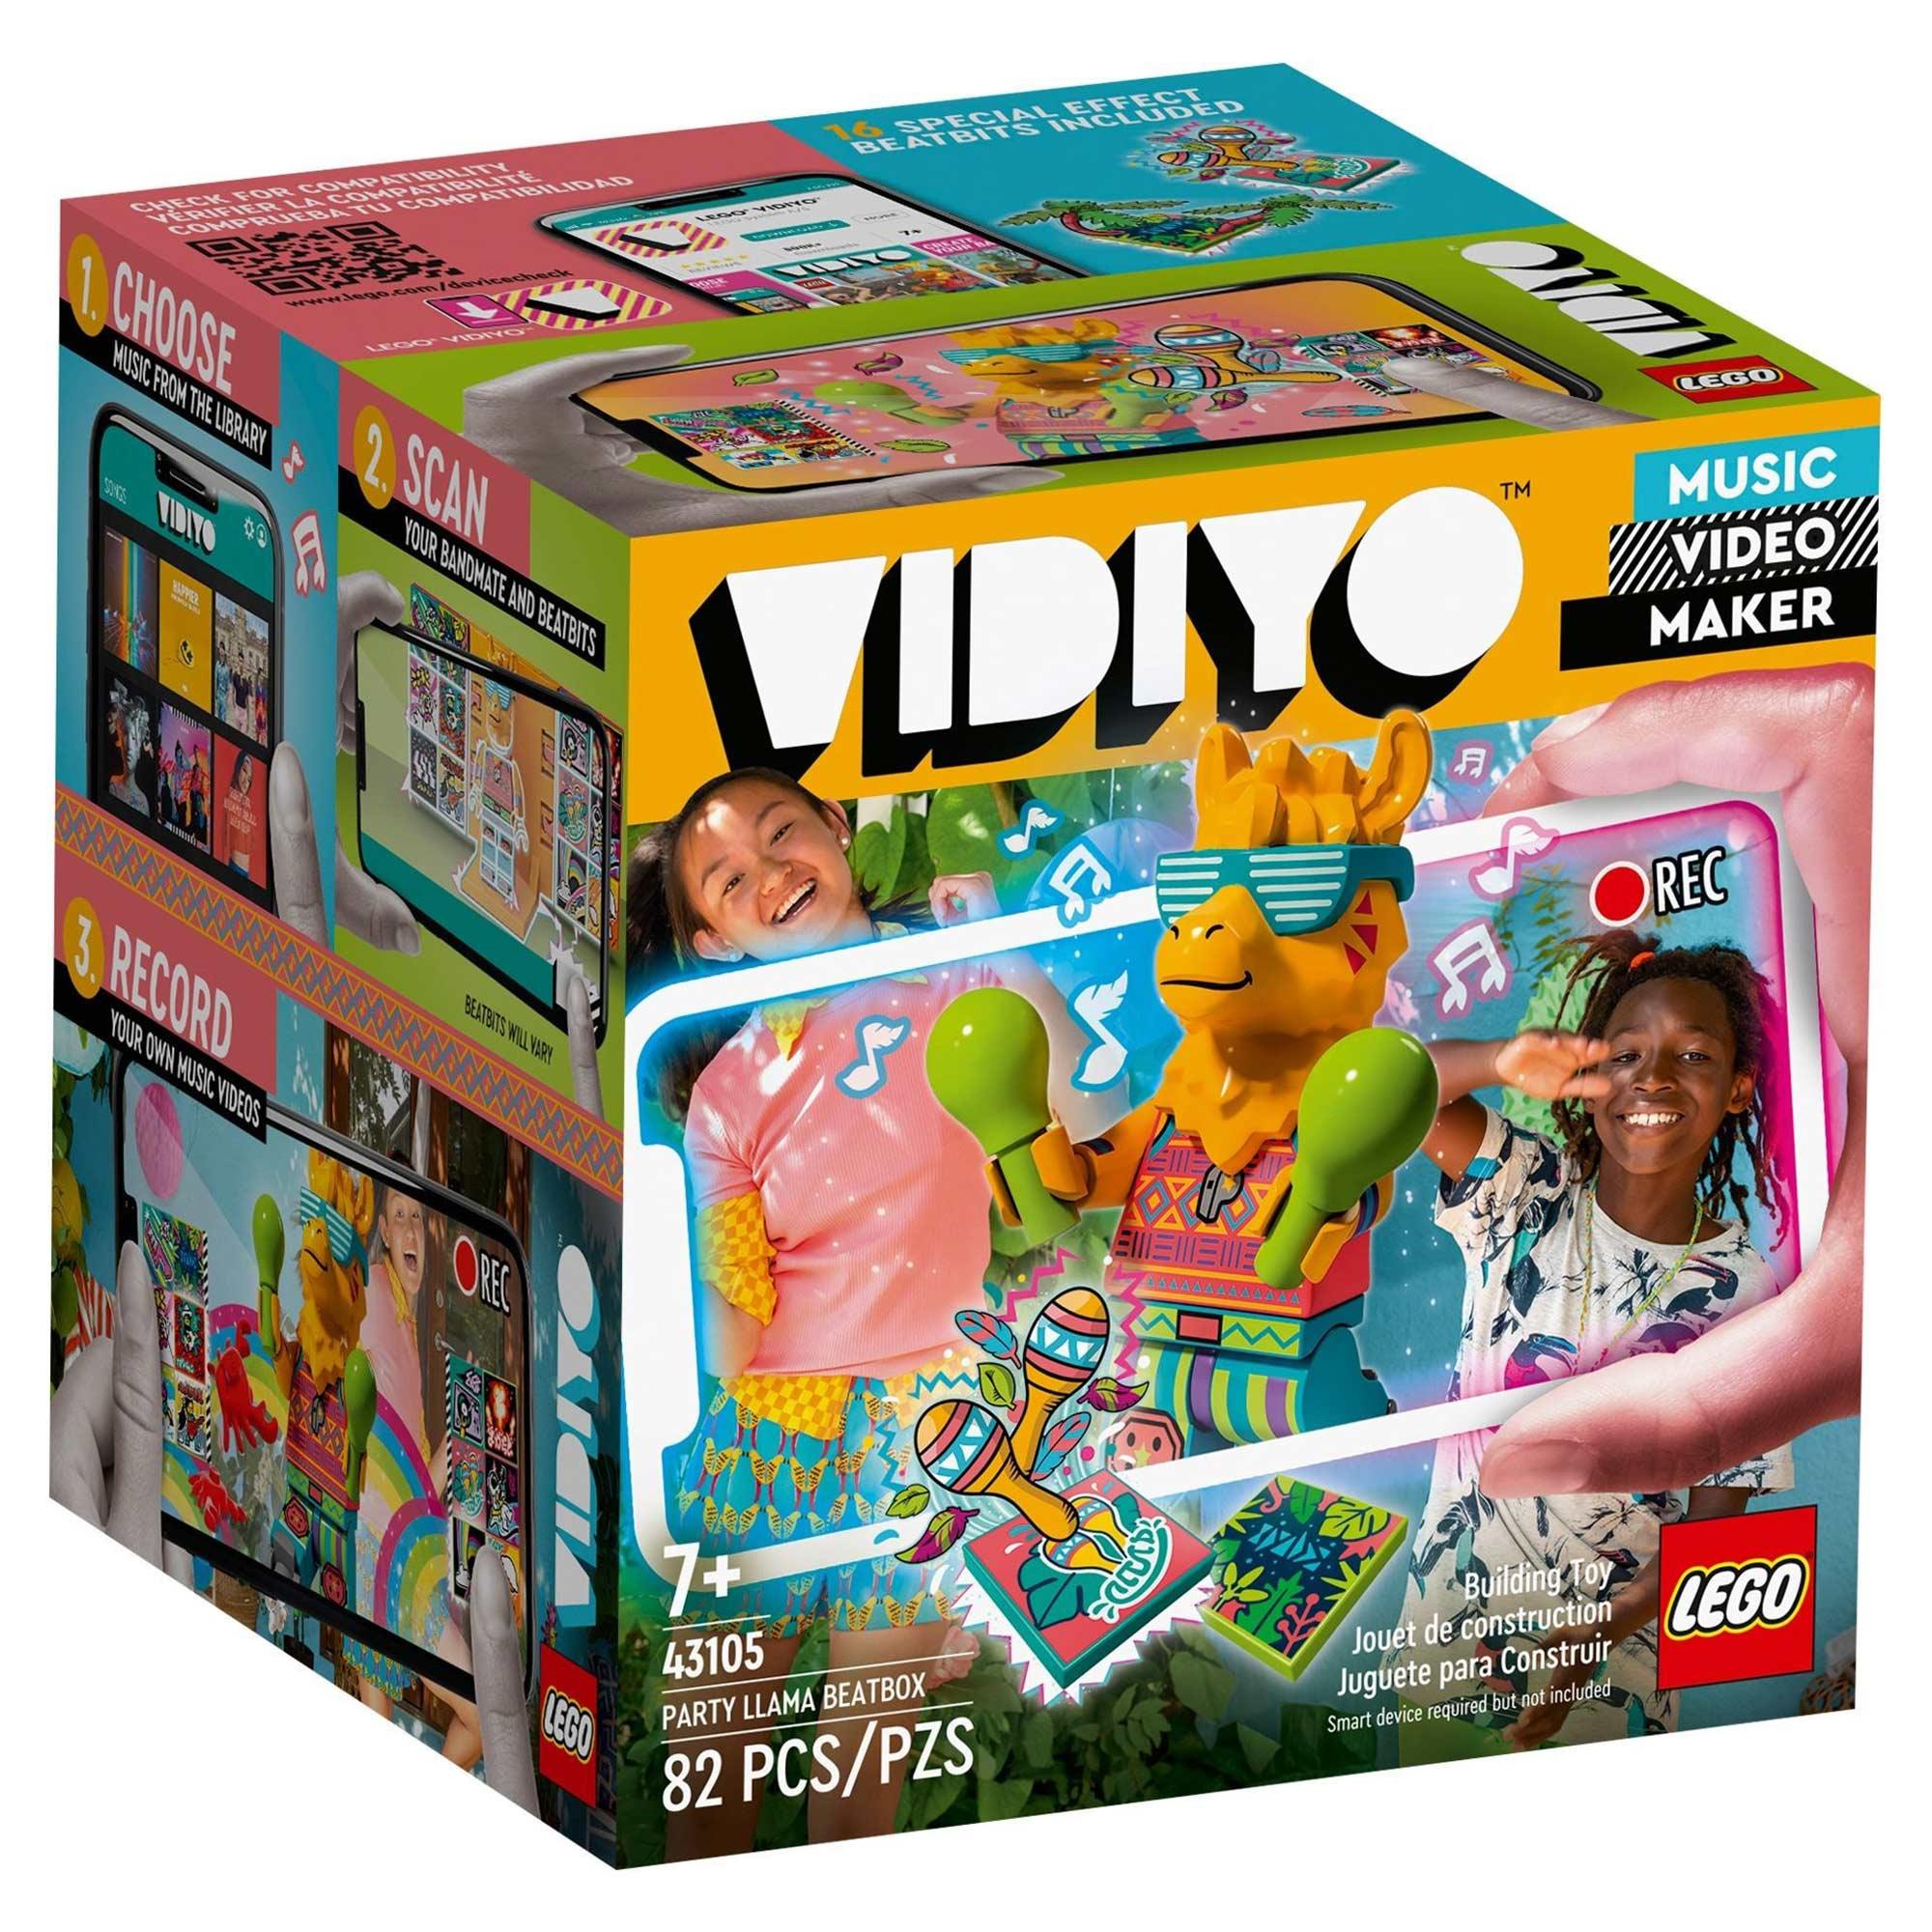 LEGO 43105 VIDIYO Party Llama BeatBox at Hobby Warehouse